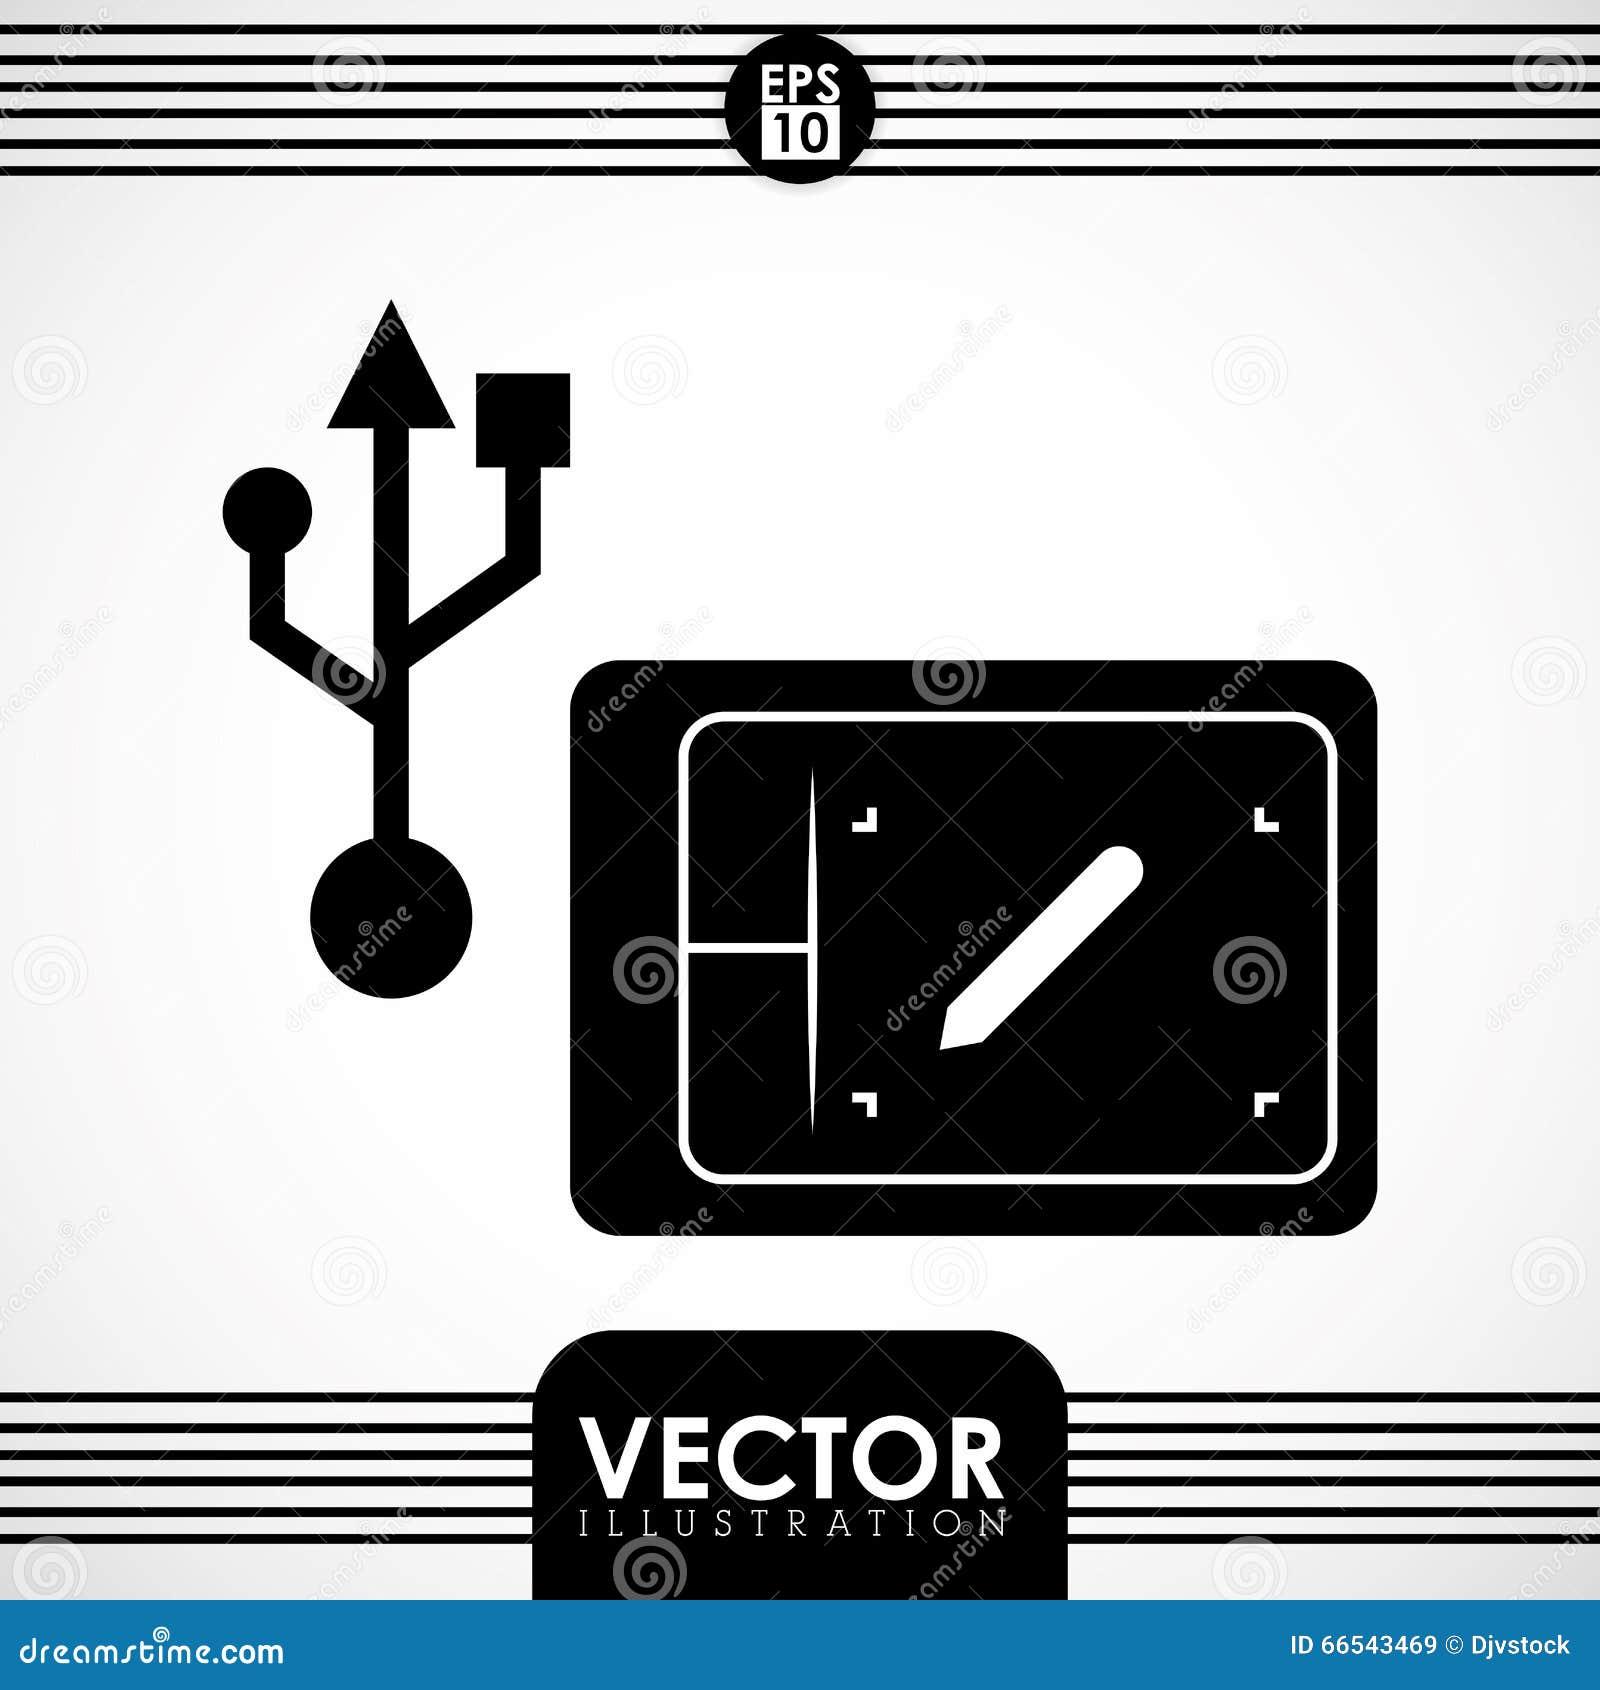 Design table icon design stock vector image 66543469 for Table design vector